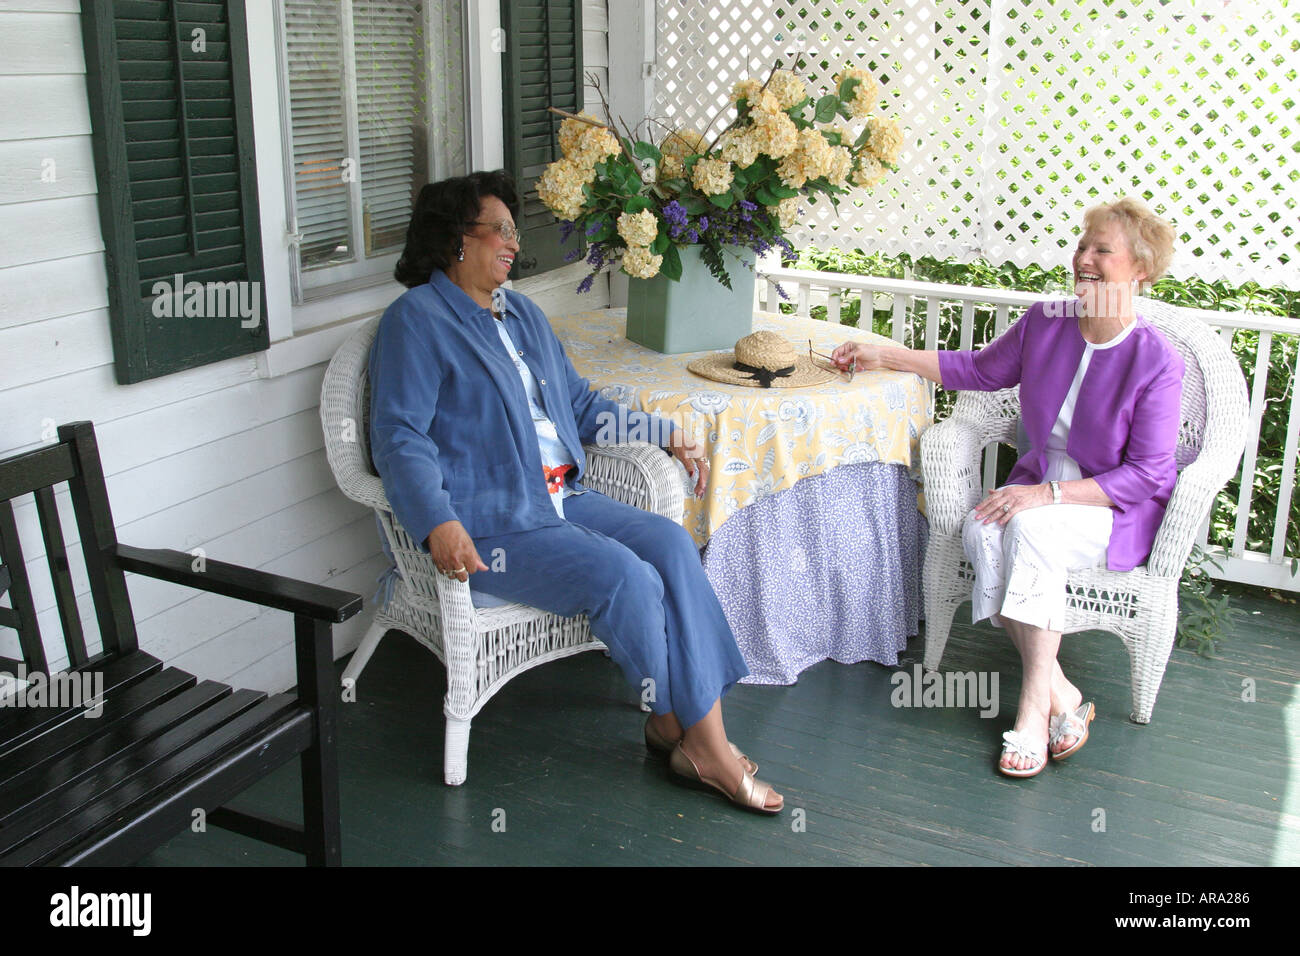 Virginia, va, Sud, Tidewater Area, Newport News, The Boxwood Inn, hôtels hôtels hôtels motels inn motel, visites Banque D'Images